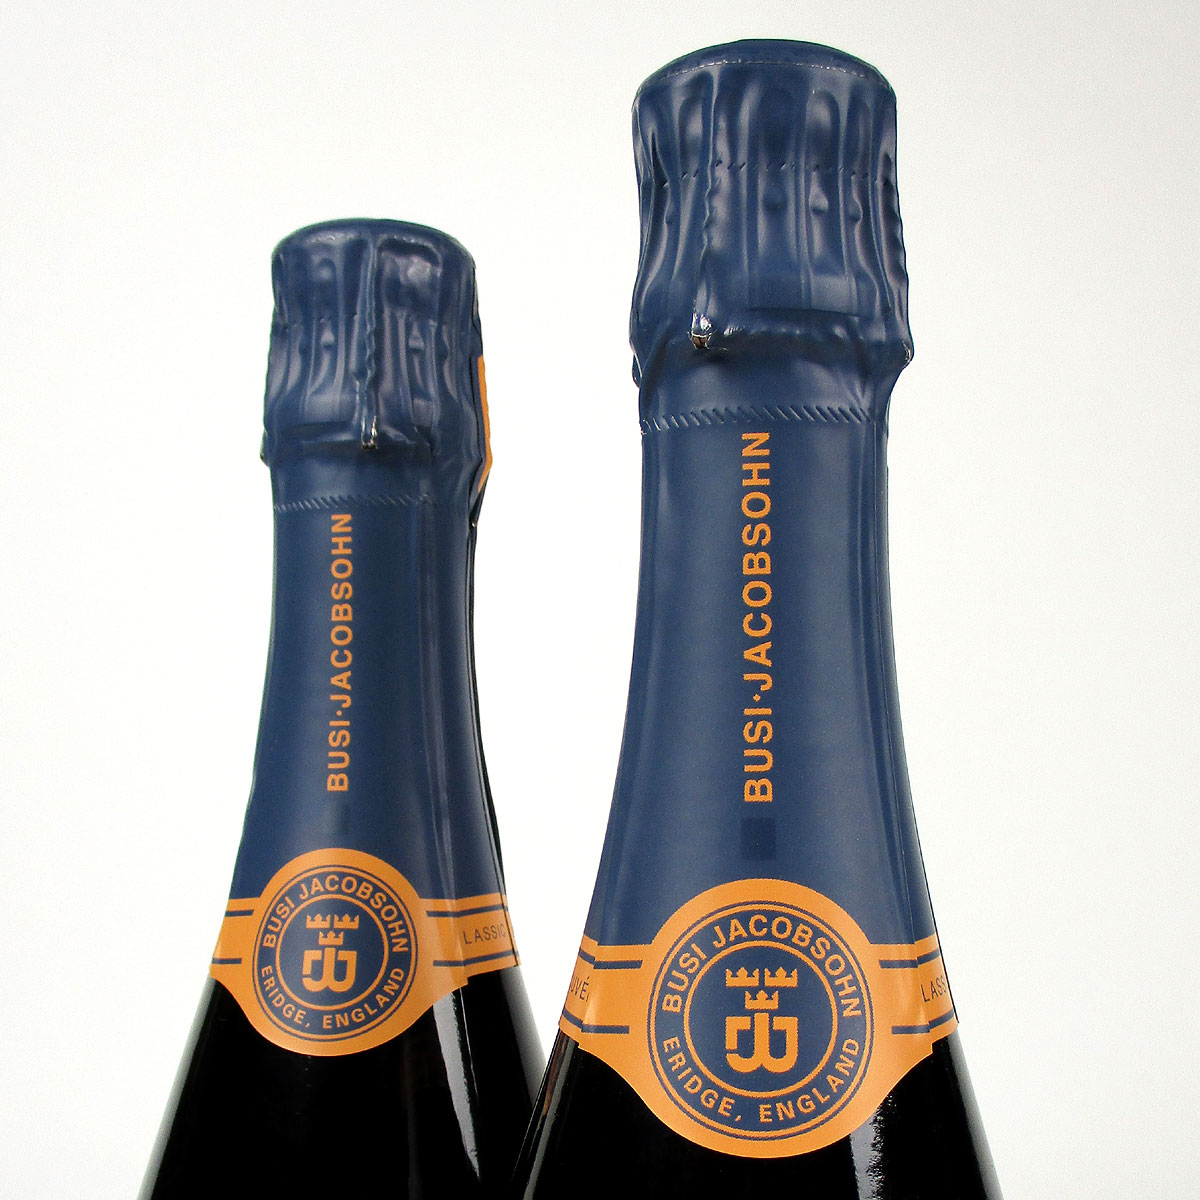 Busi Jacobsohn: 'Cuvée Brut' 2018 - Bottle Foils